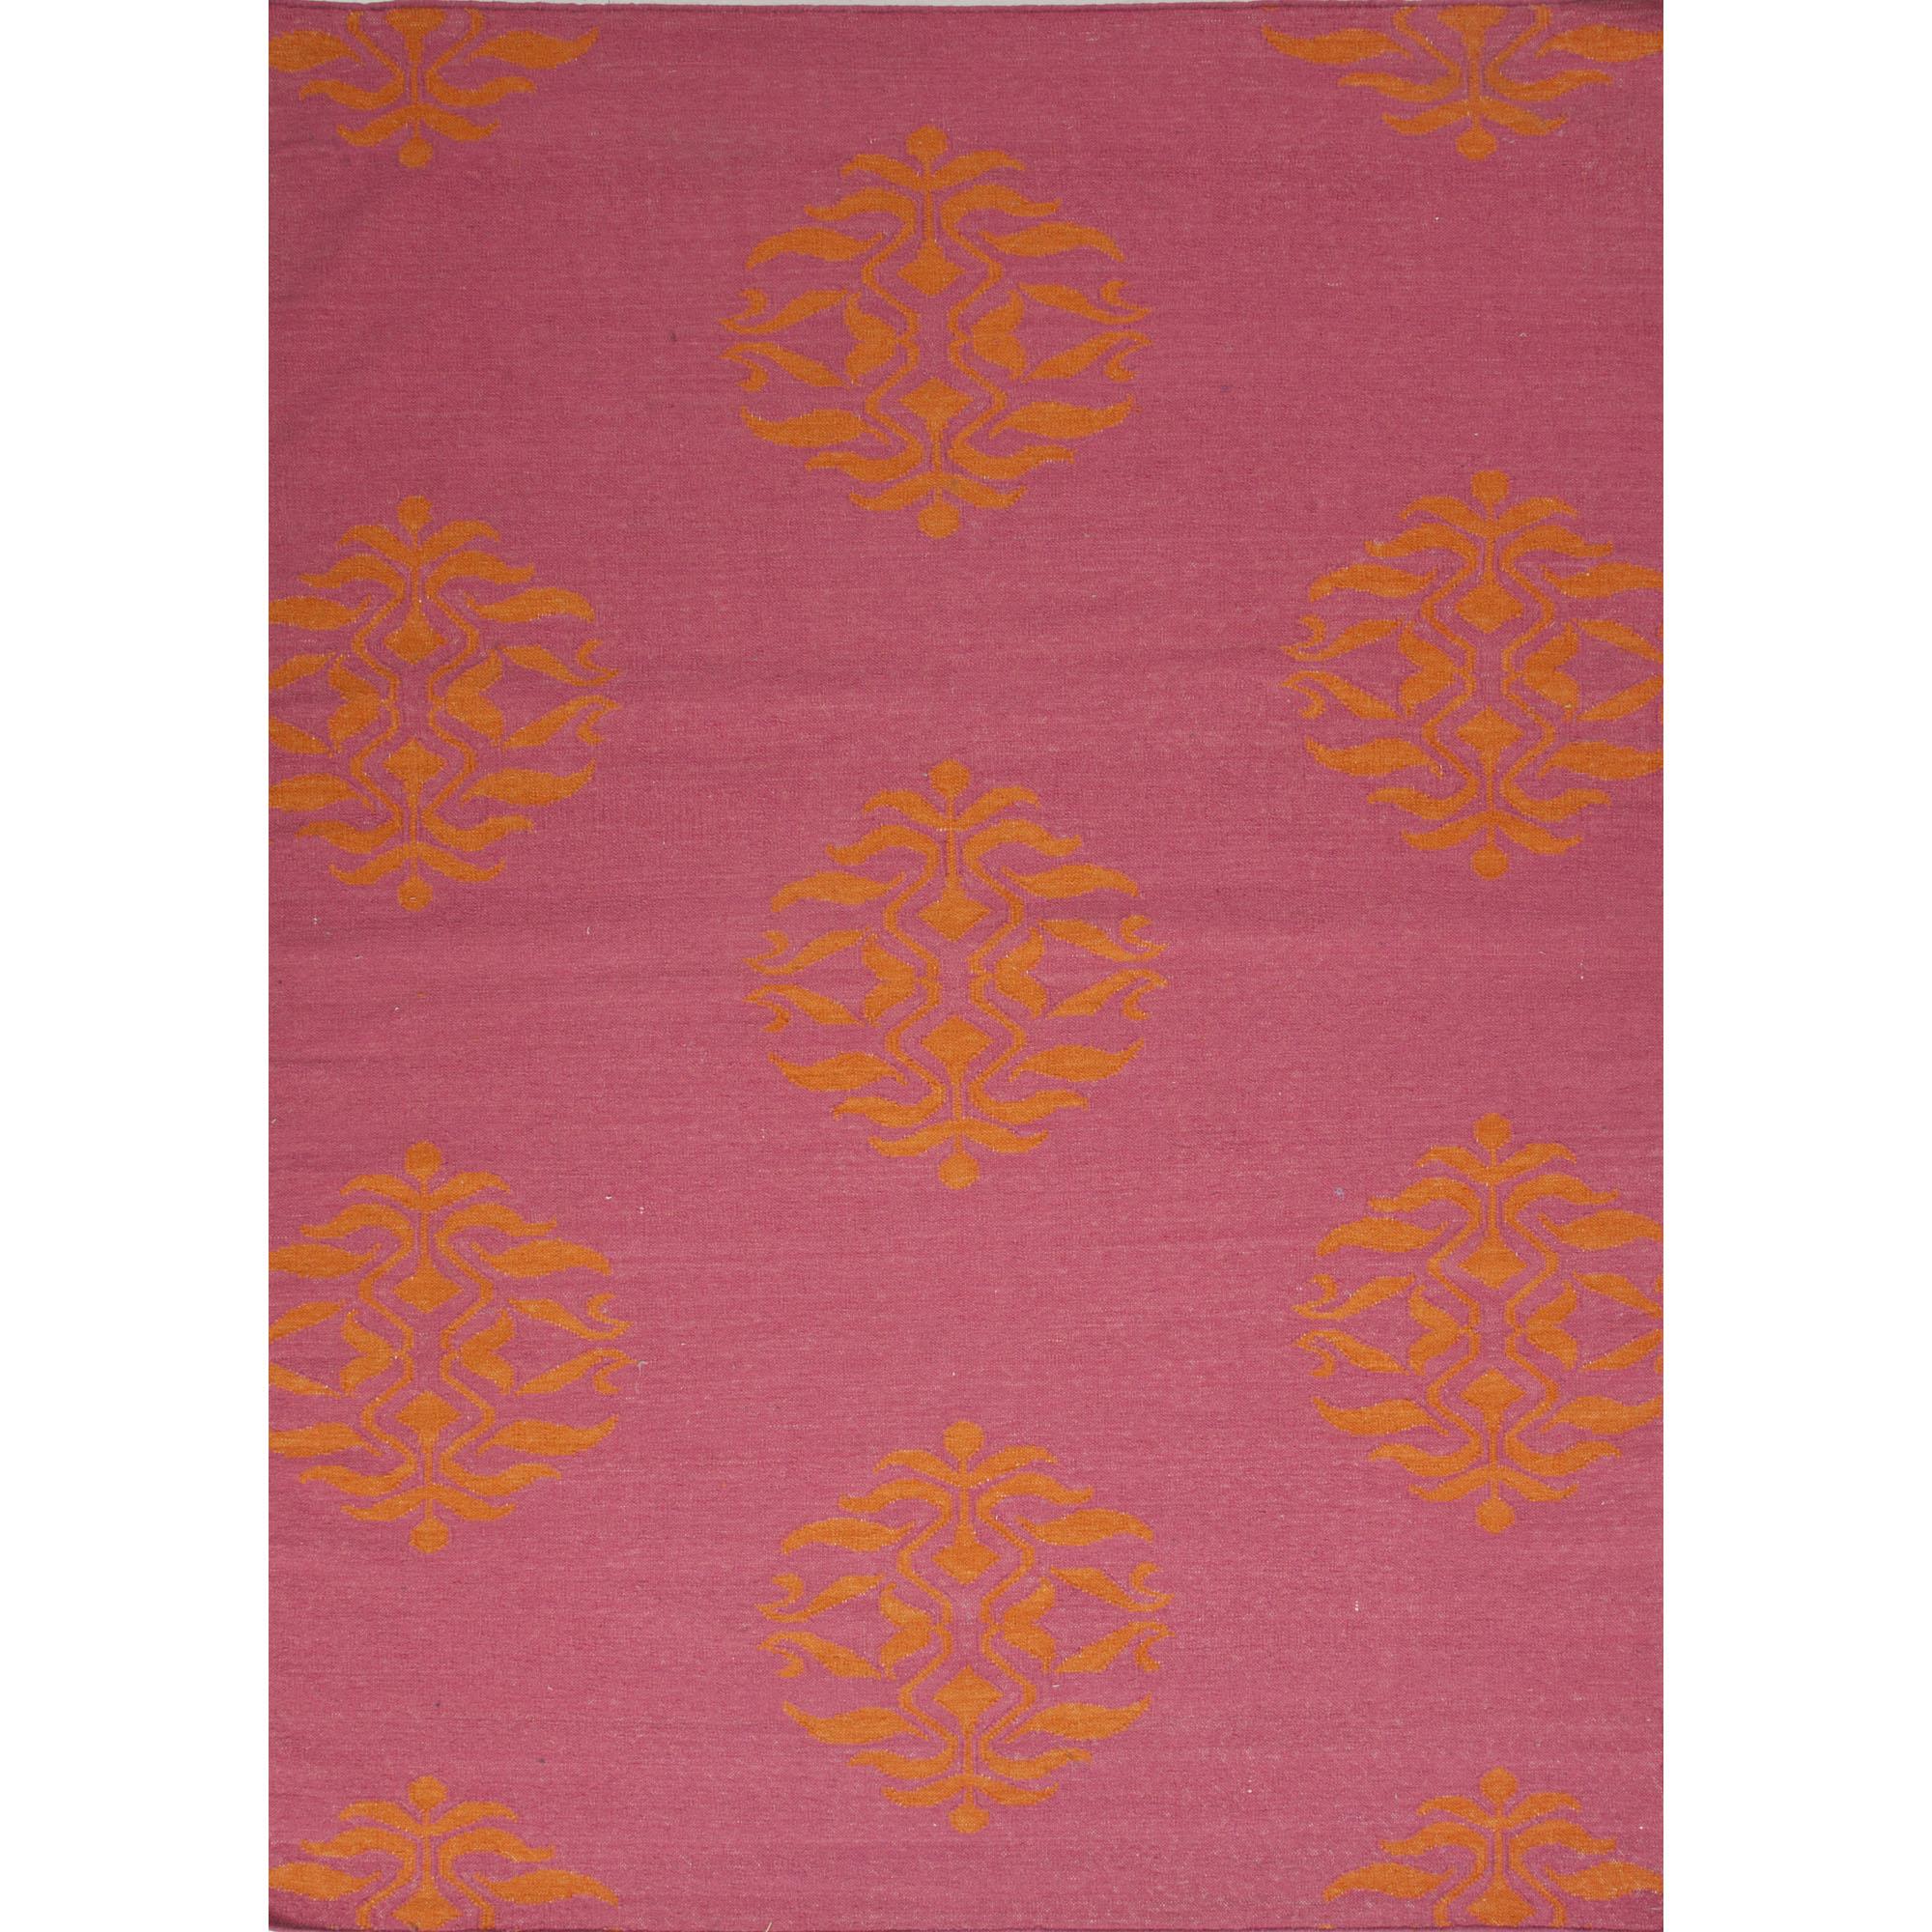 JAIPUR Rugs Maroc 2 x 3 Rug - Item Number: RUG102612